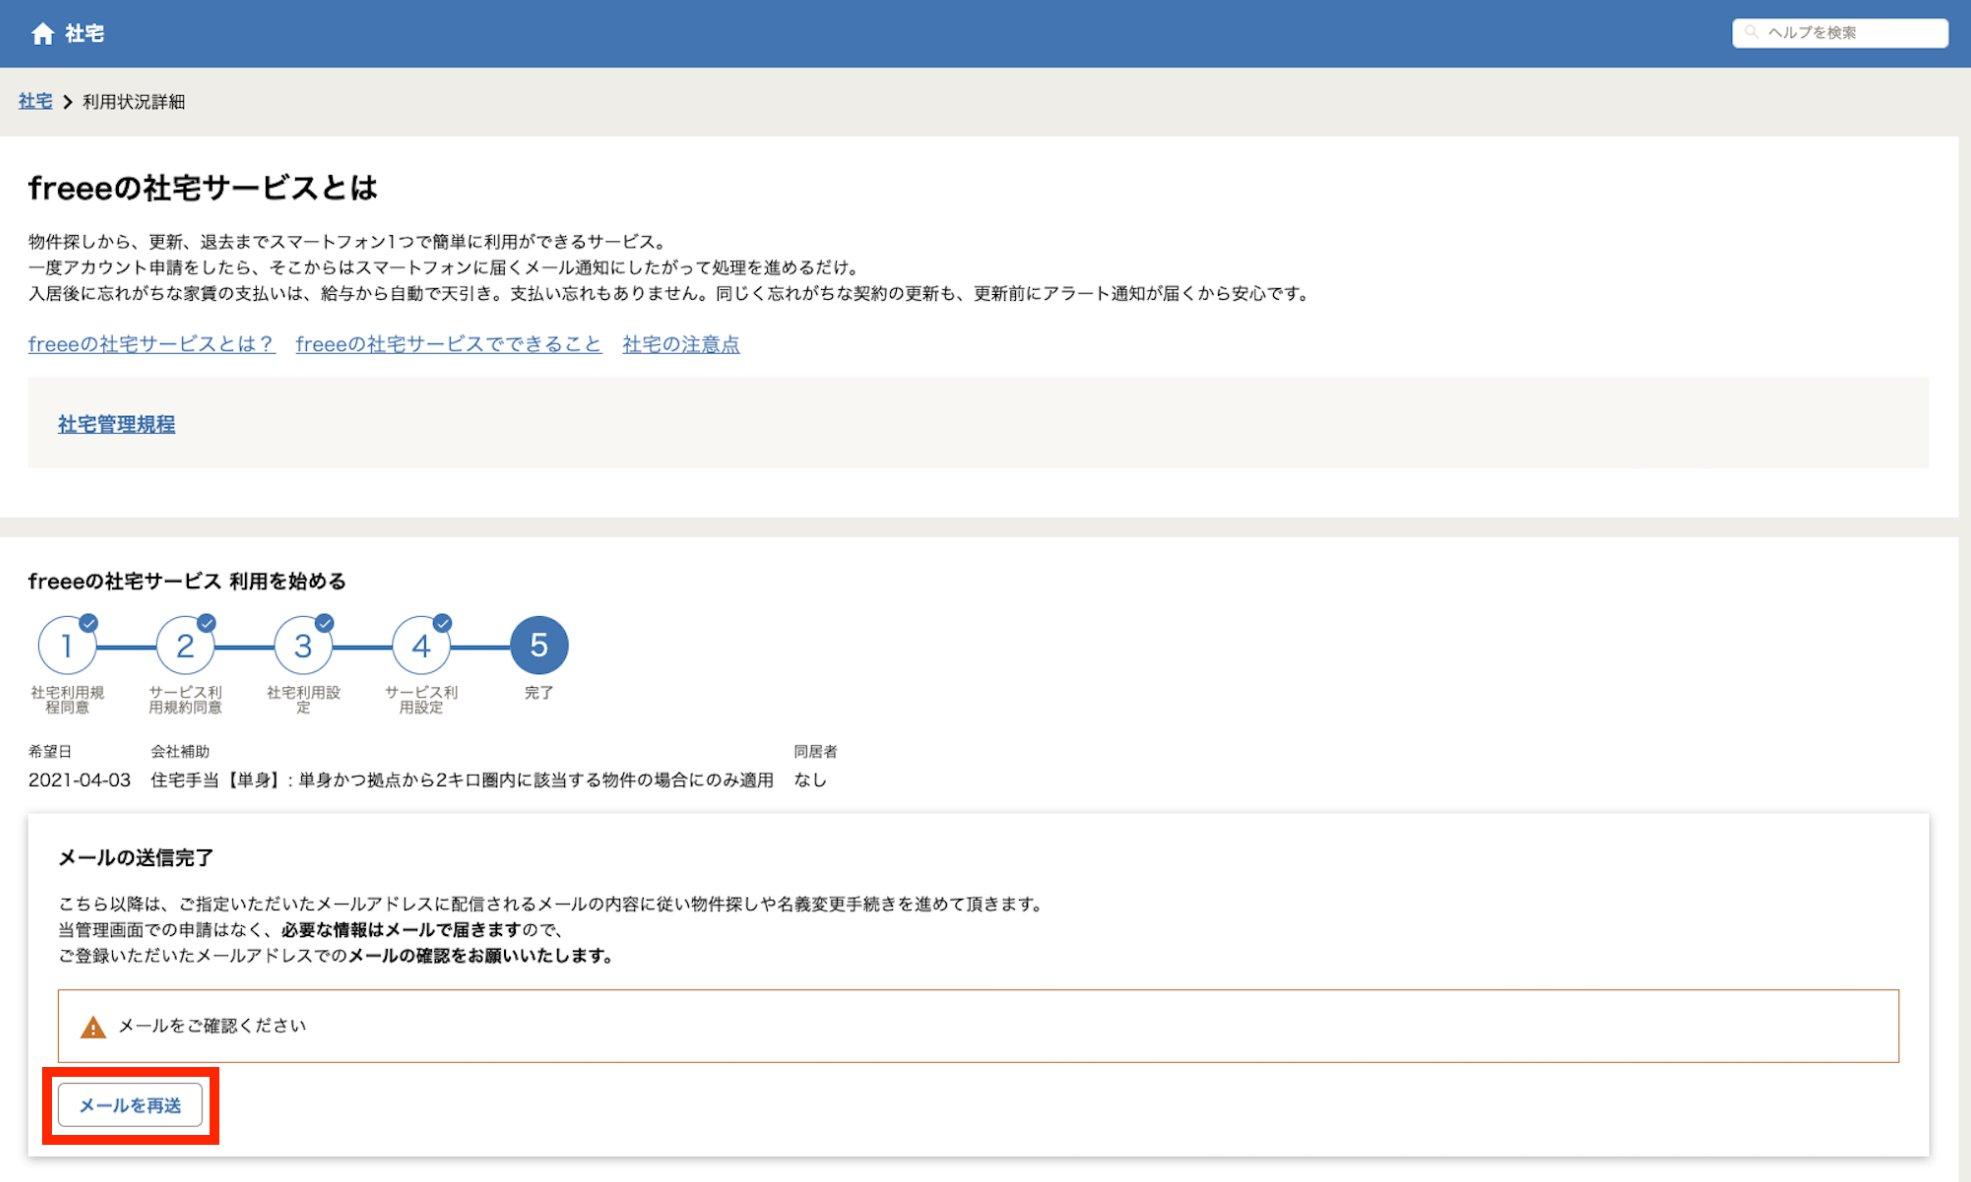 freeeの社宅サービス利用を始める画面の[メールを再送]ボタンを指し示しているスクリーンショット